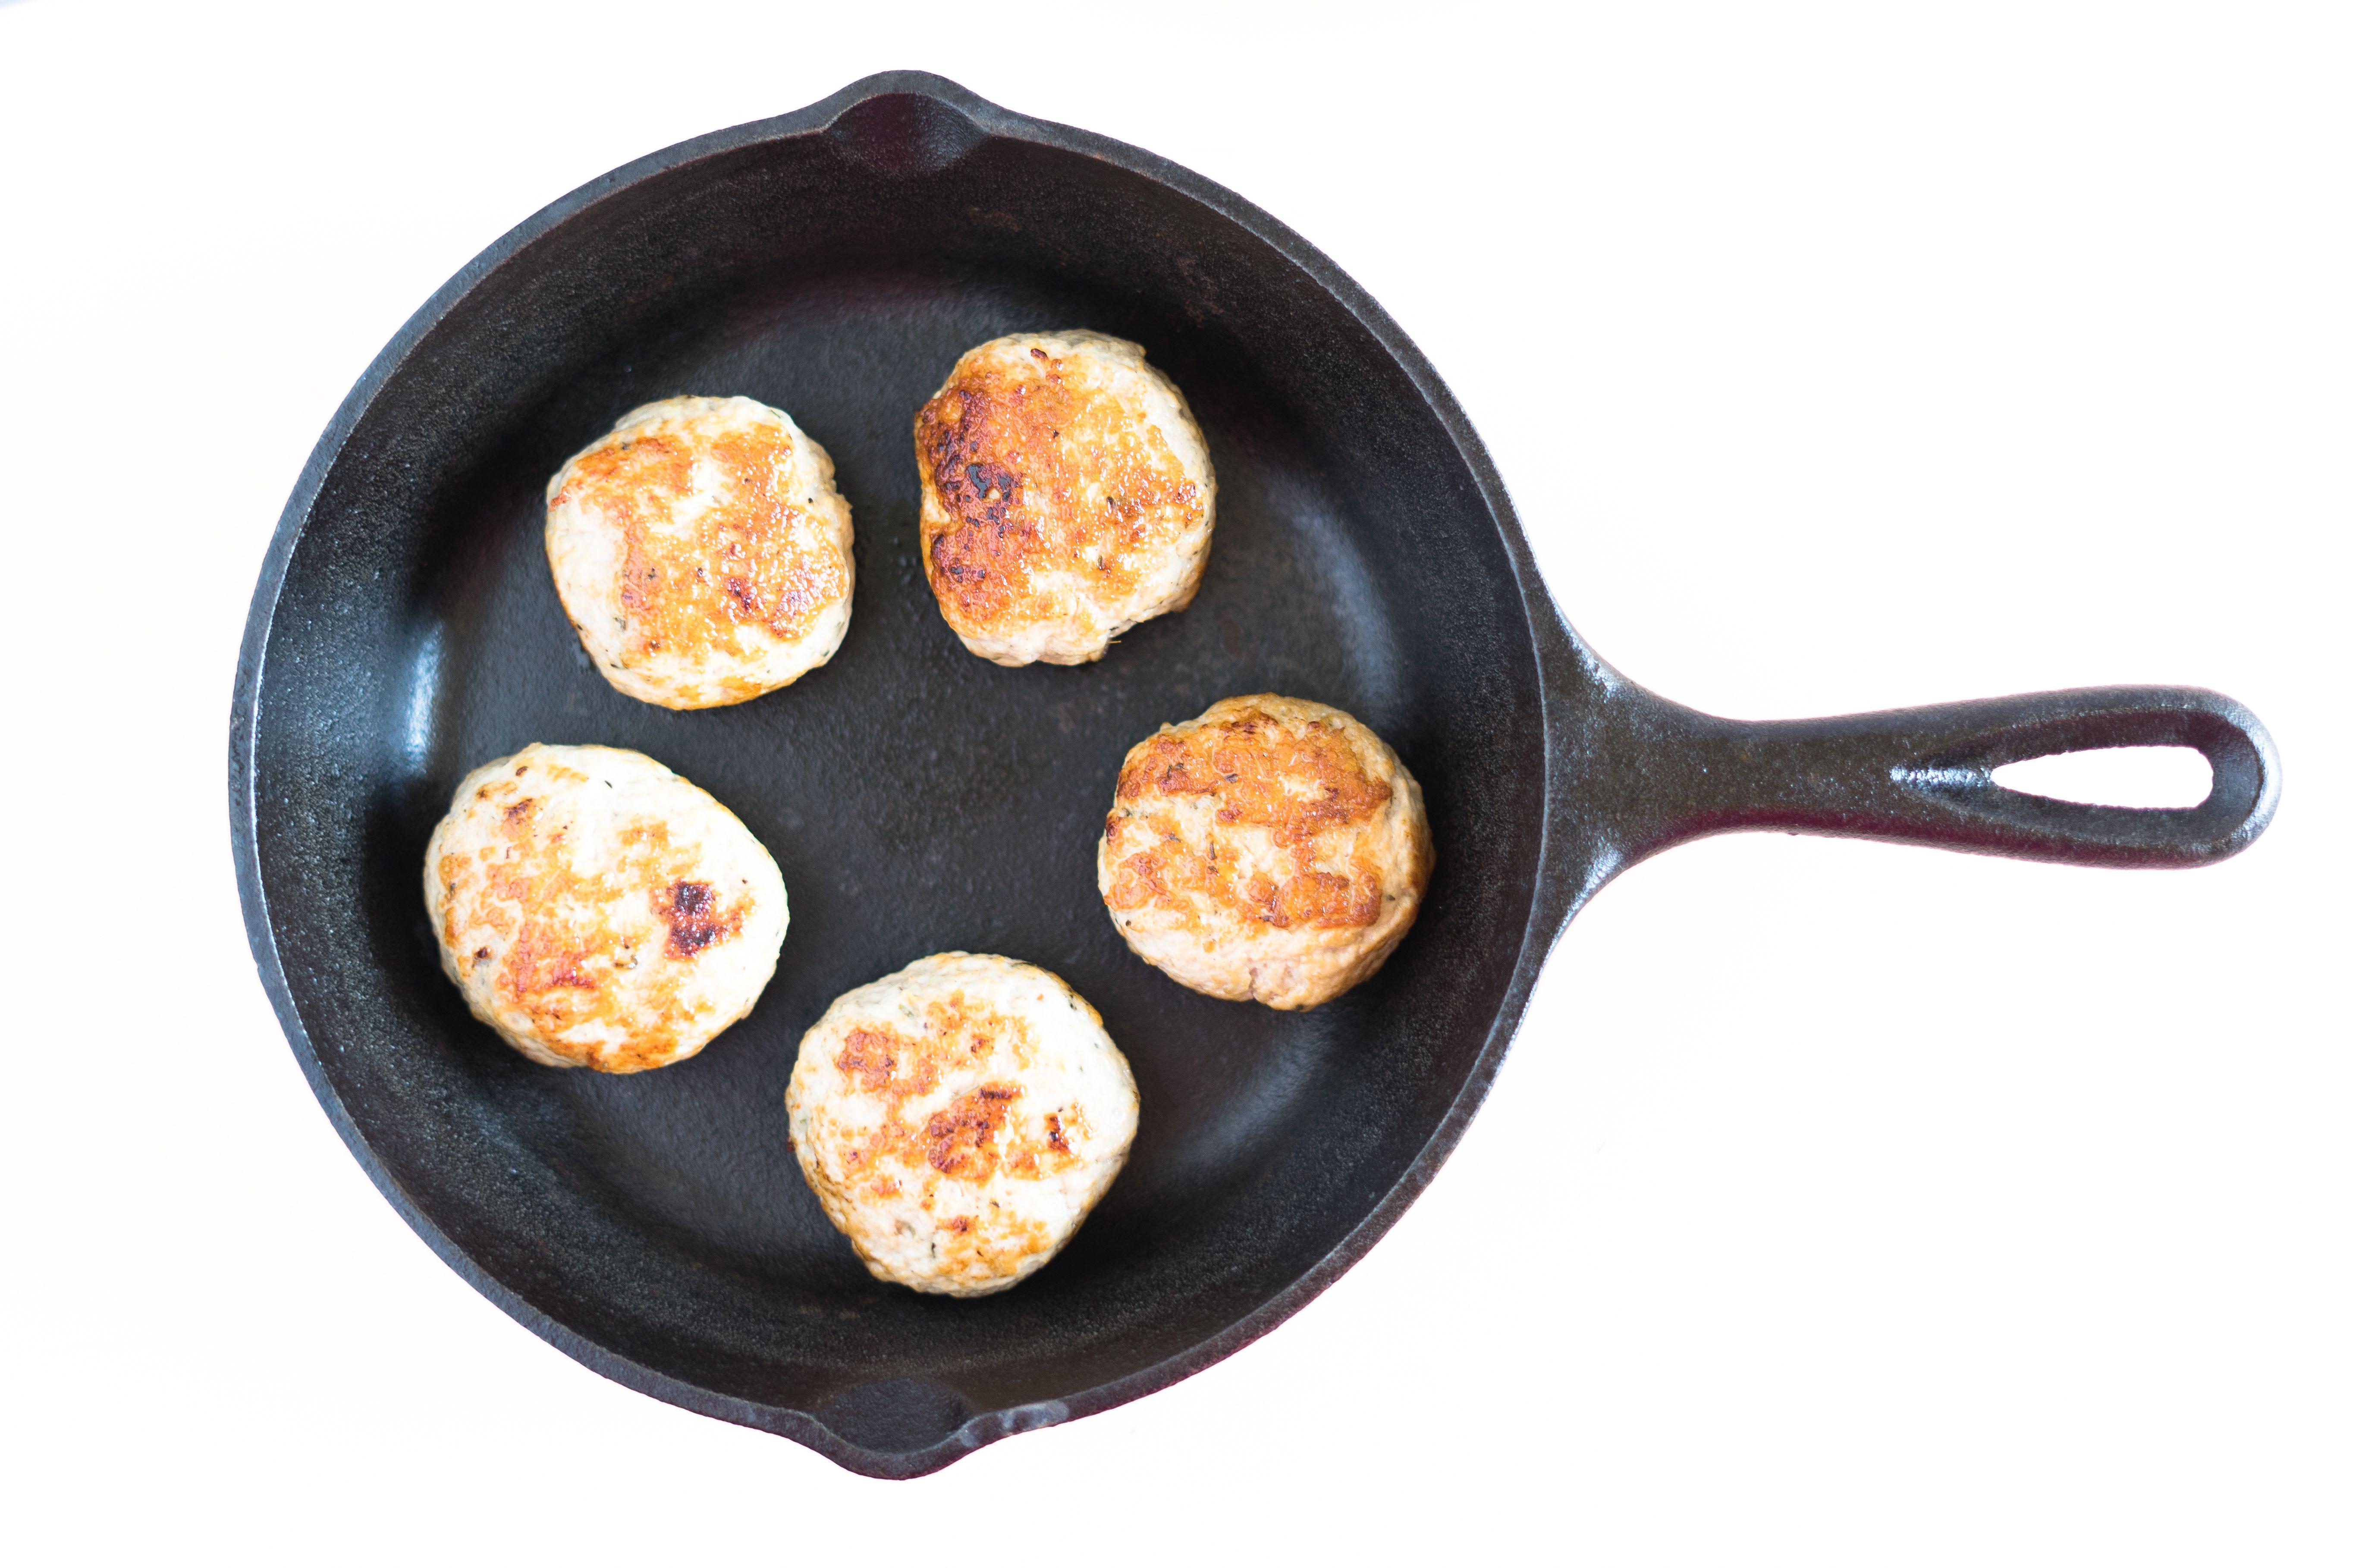 Shape sausage patties and fry